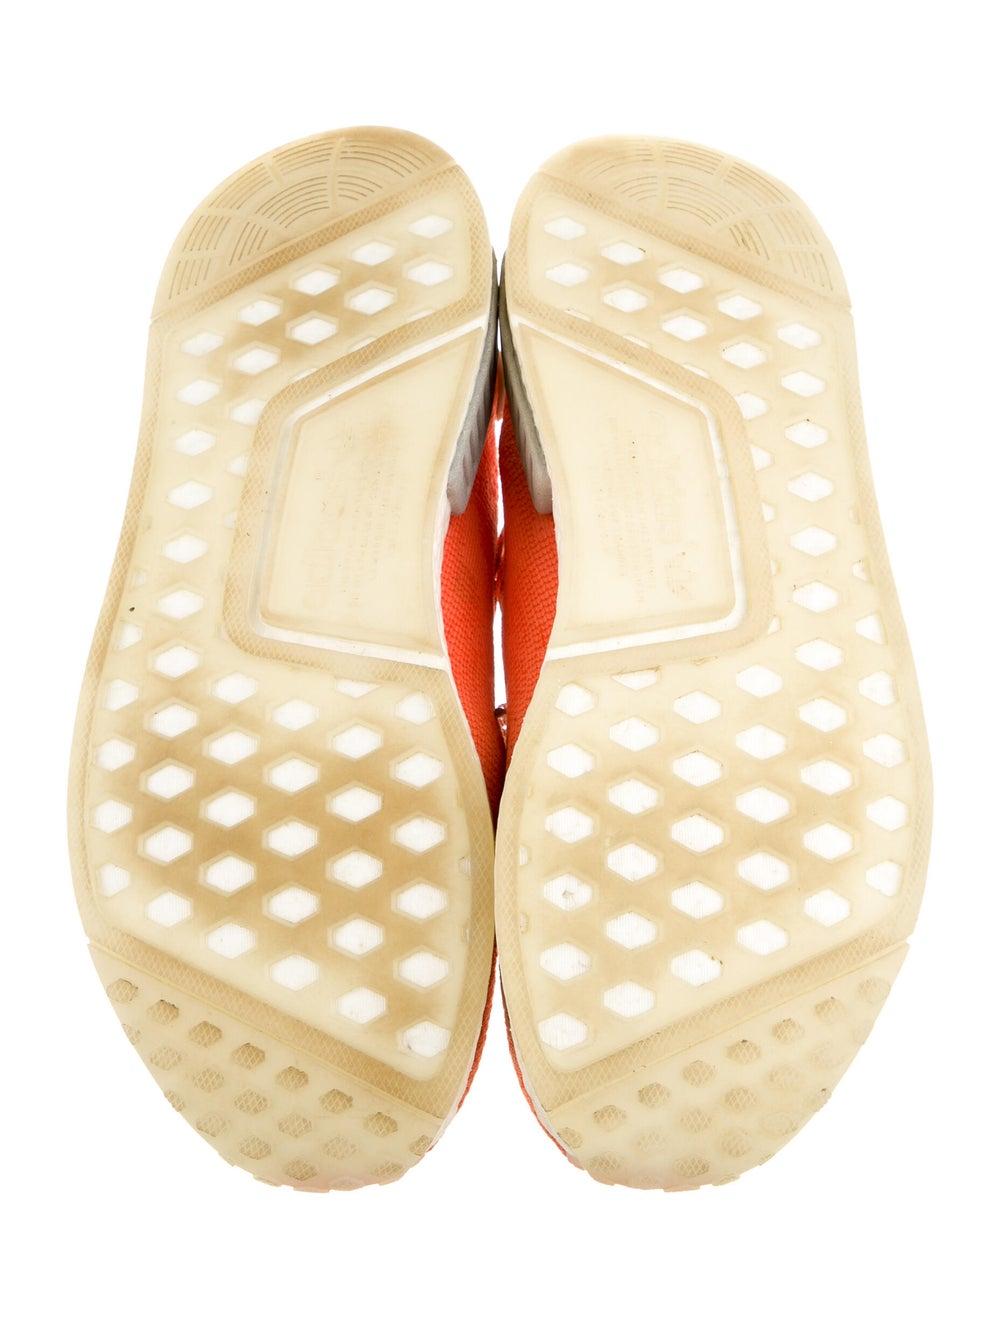 Adidas Athletic Sneakers Orange - image 5